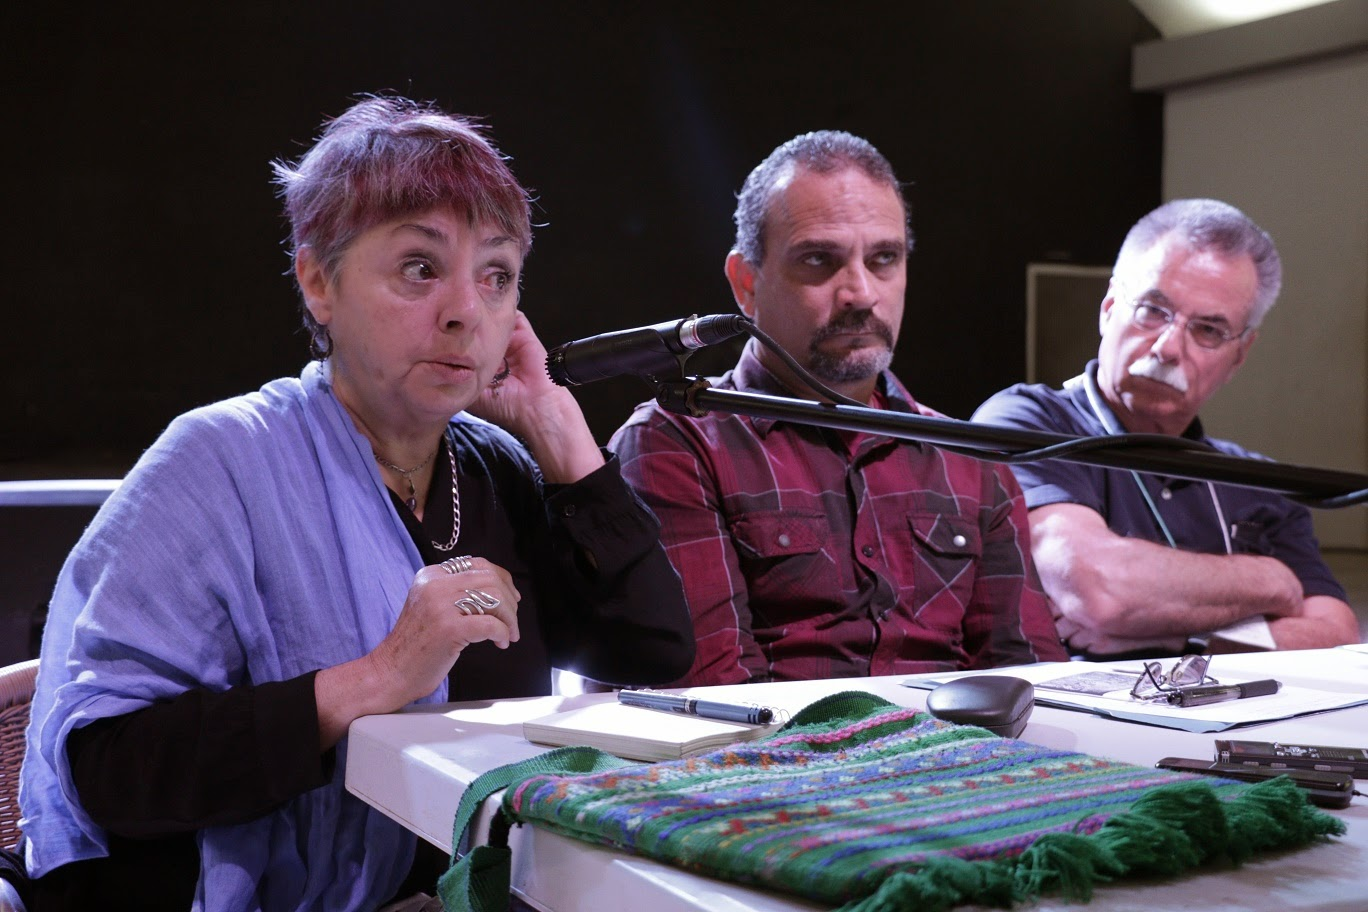 Ana Esther, Humberto y Leo Mayer